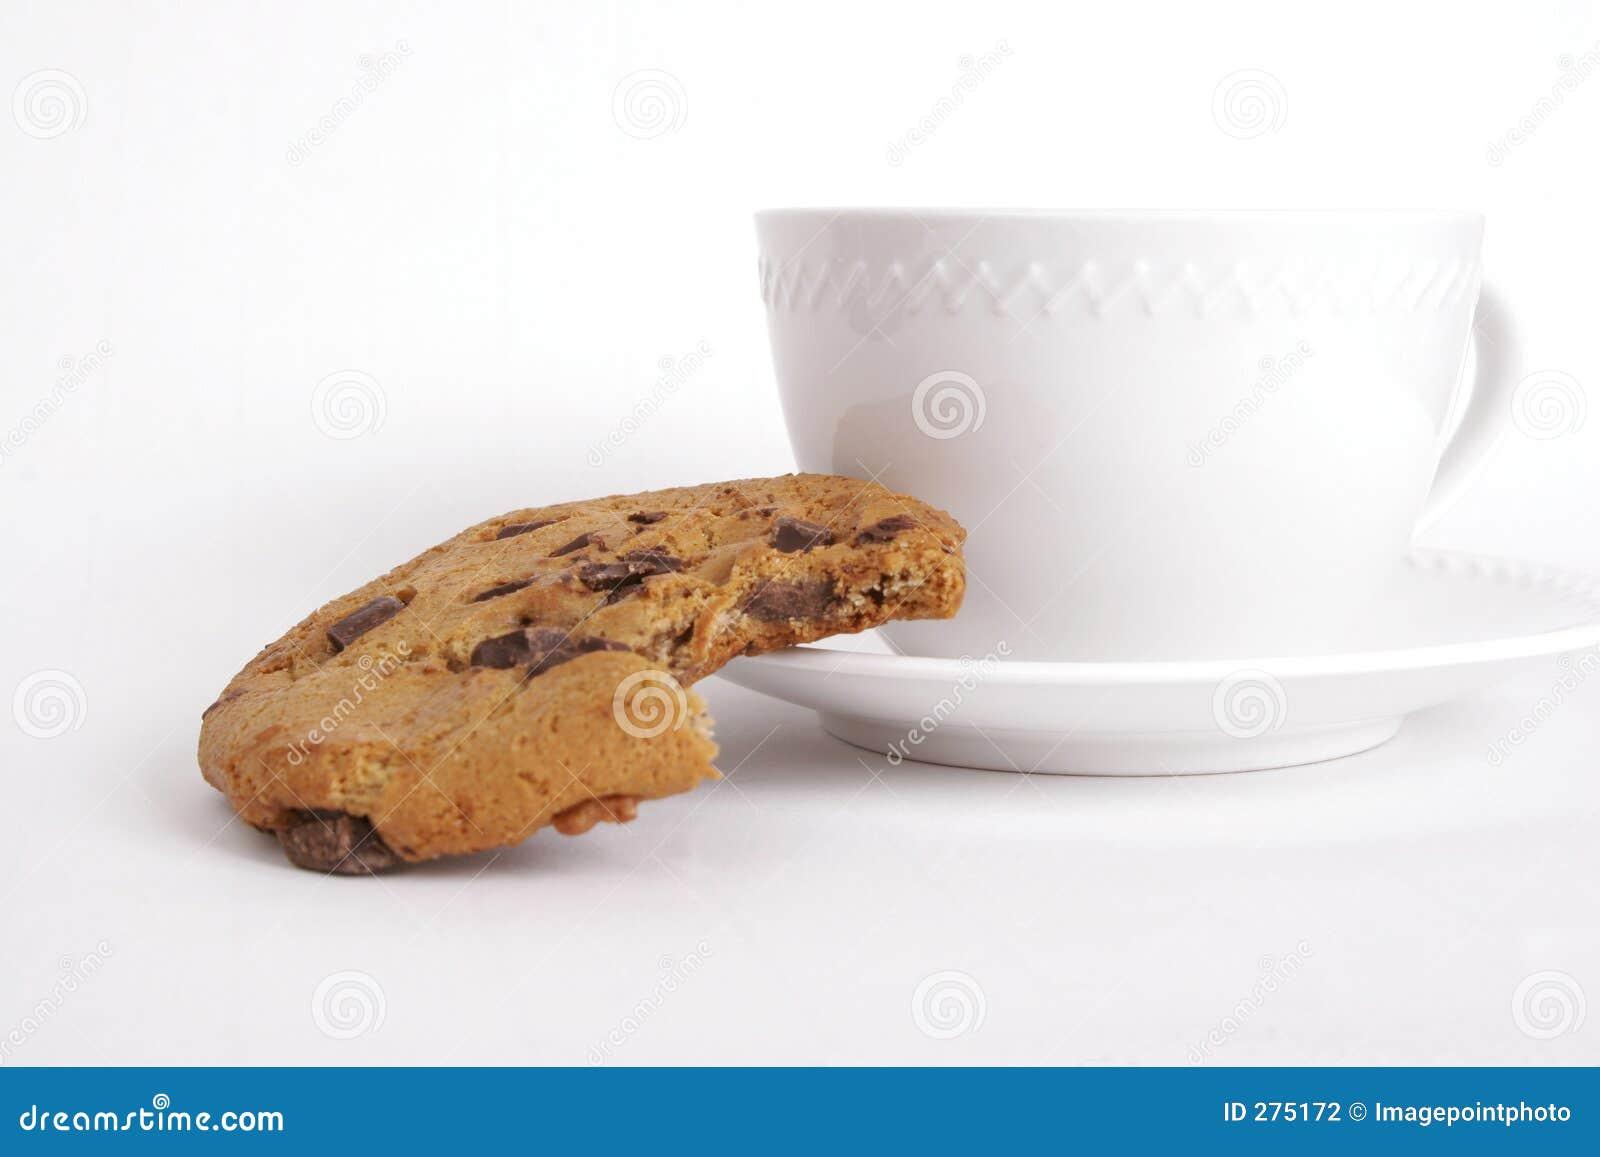 Koekje met koffie